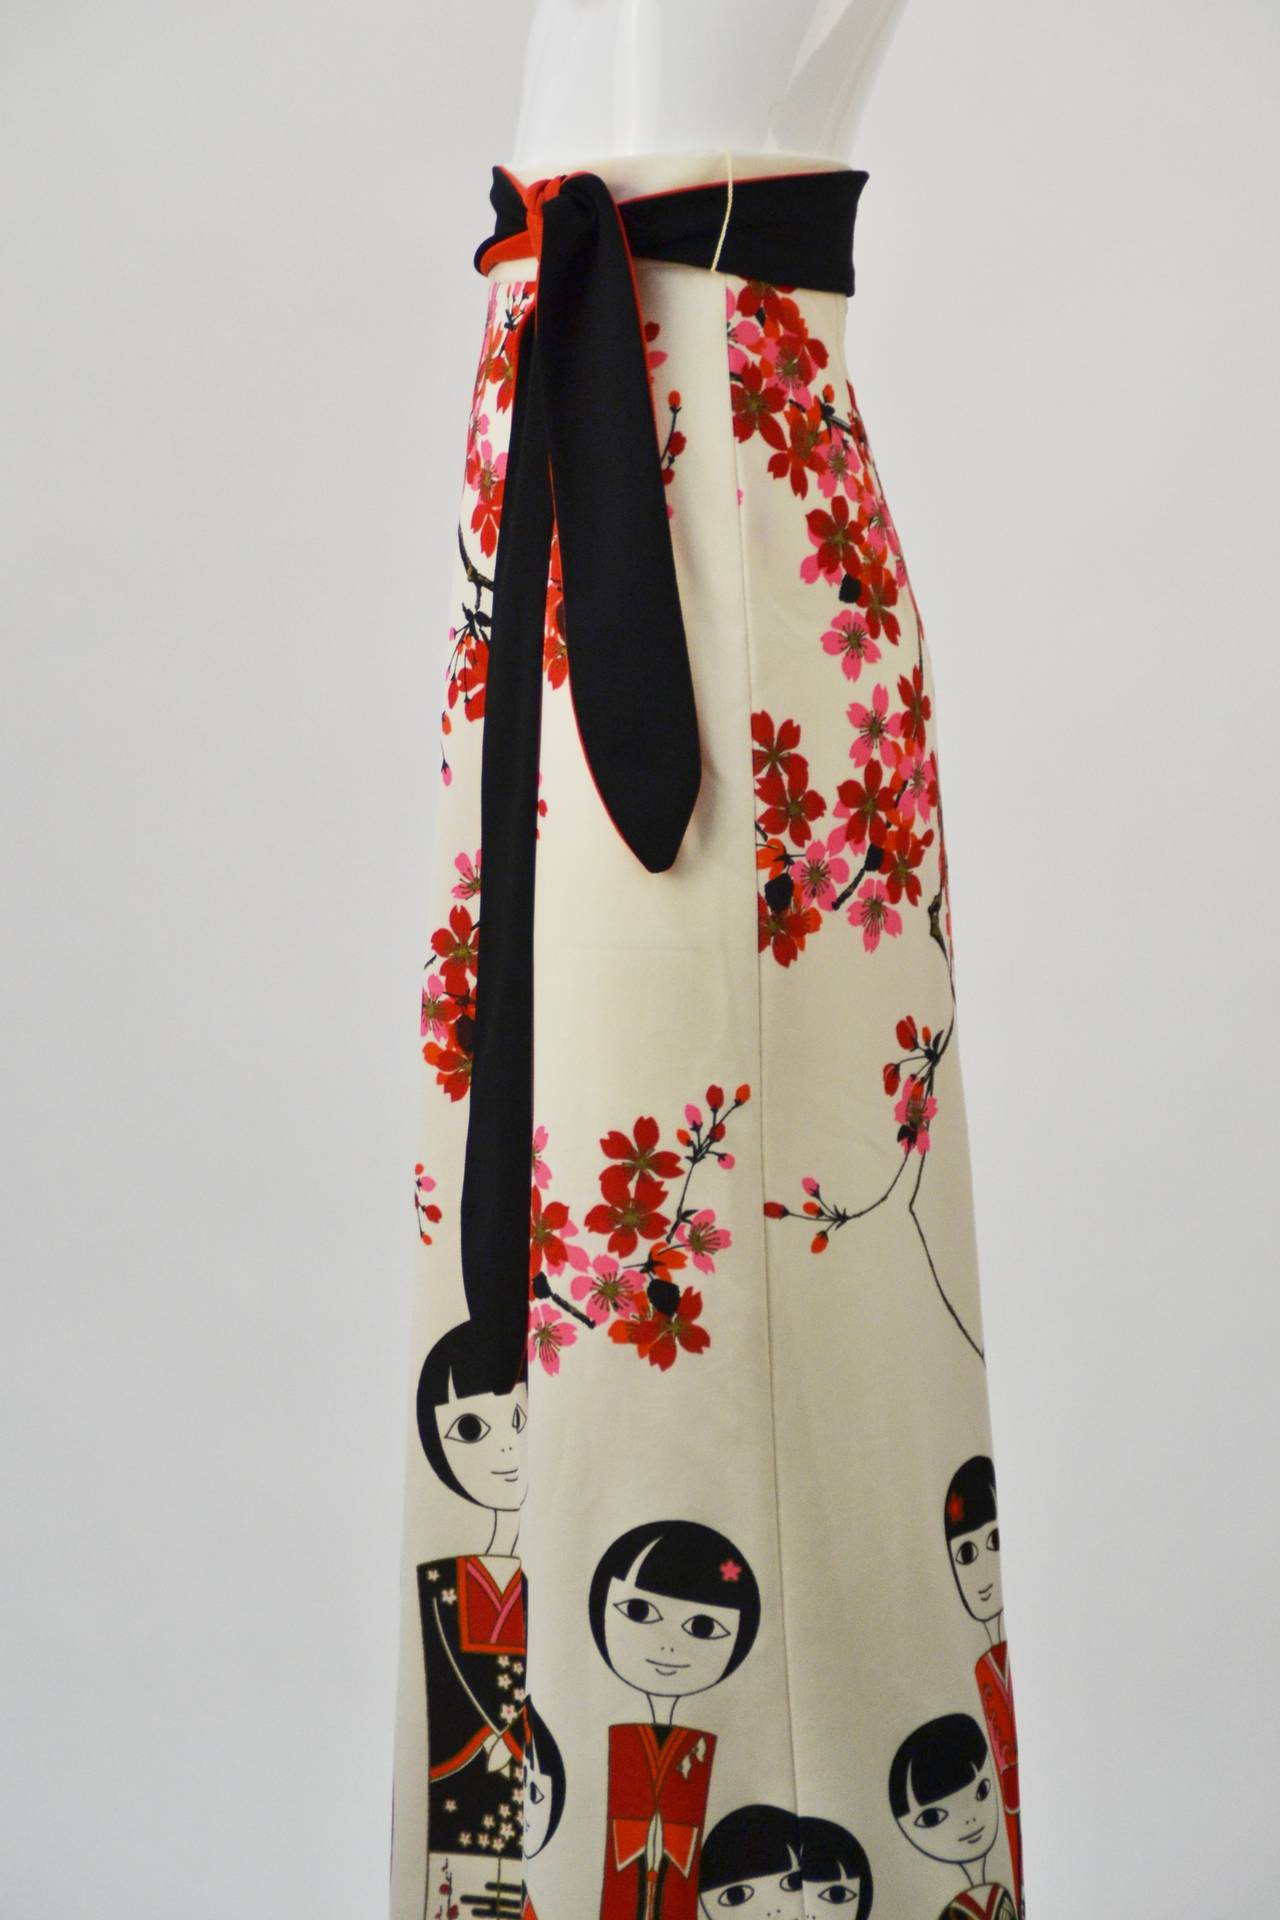 Women's 1960s Shaheen Kokeshi Doll Border Print Maxi Skirt with Obi Belt